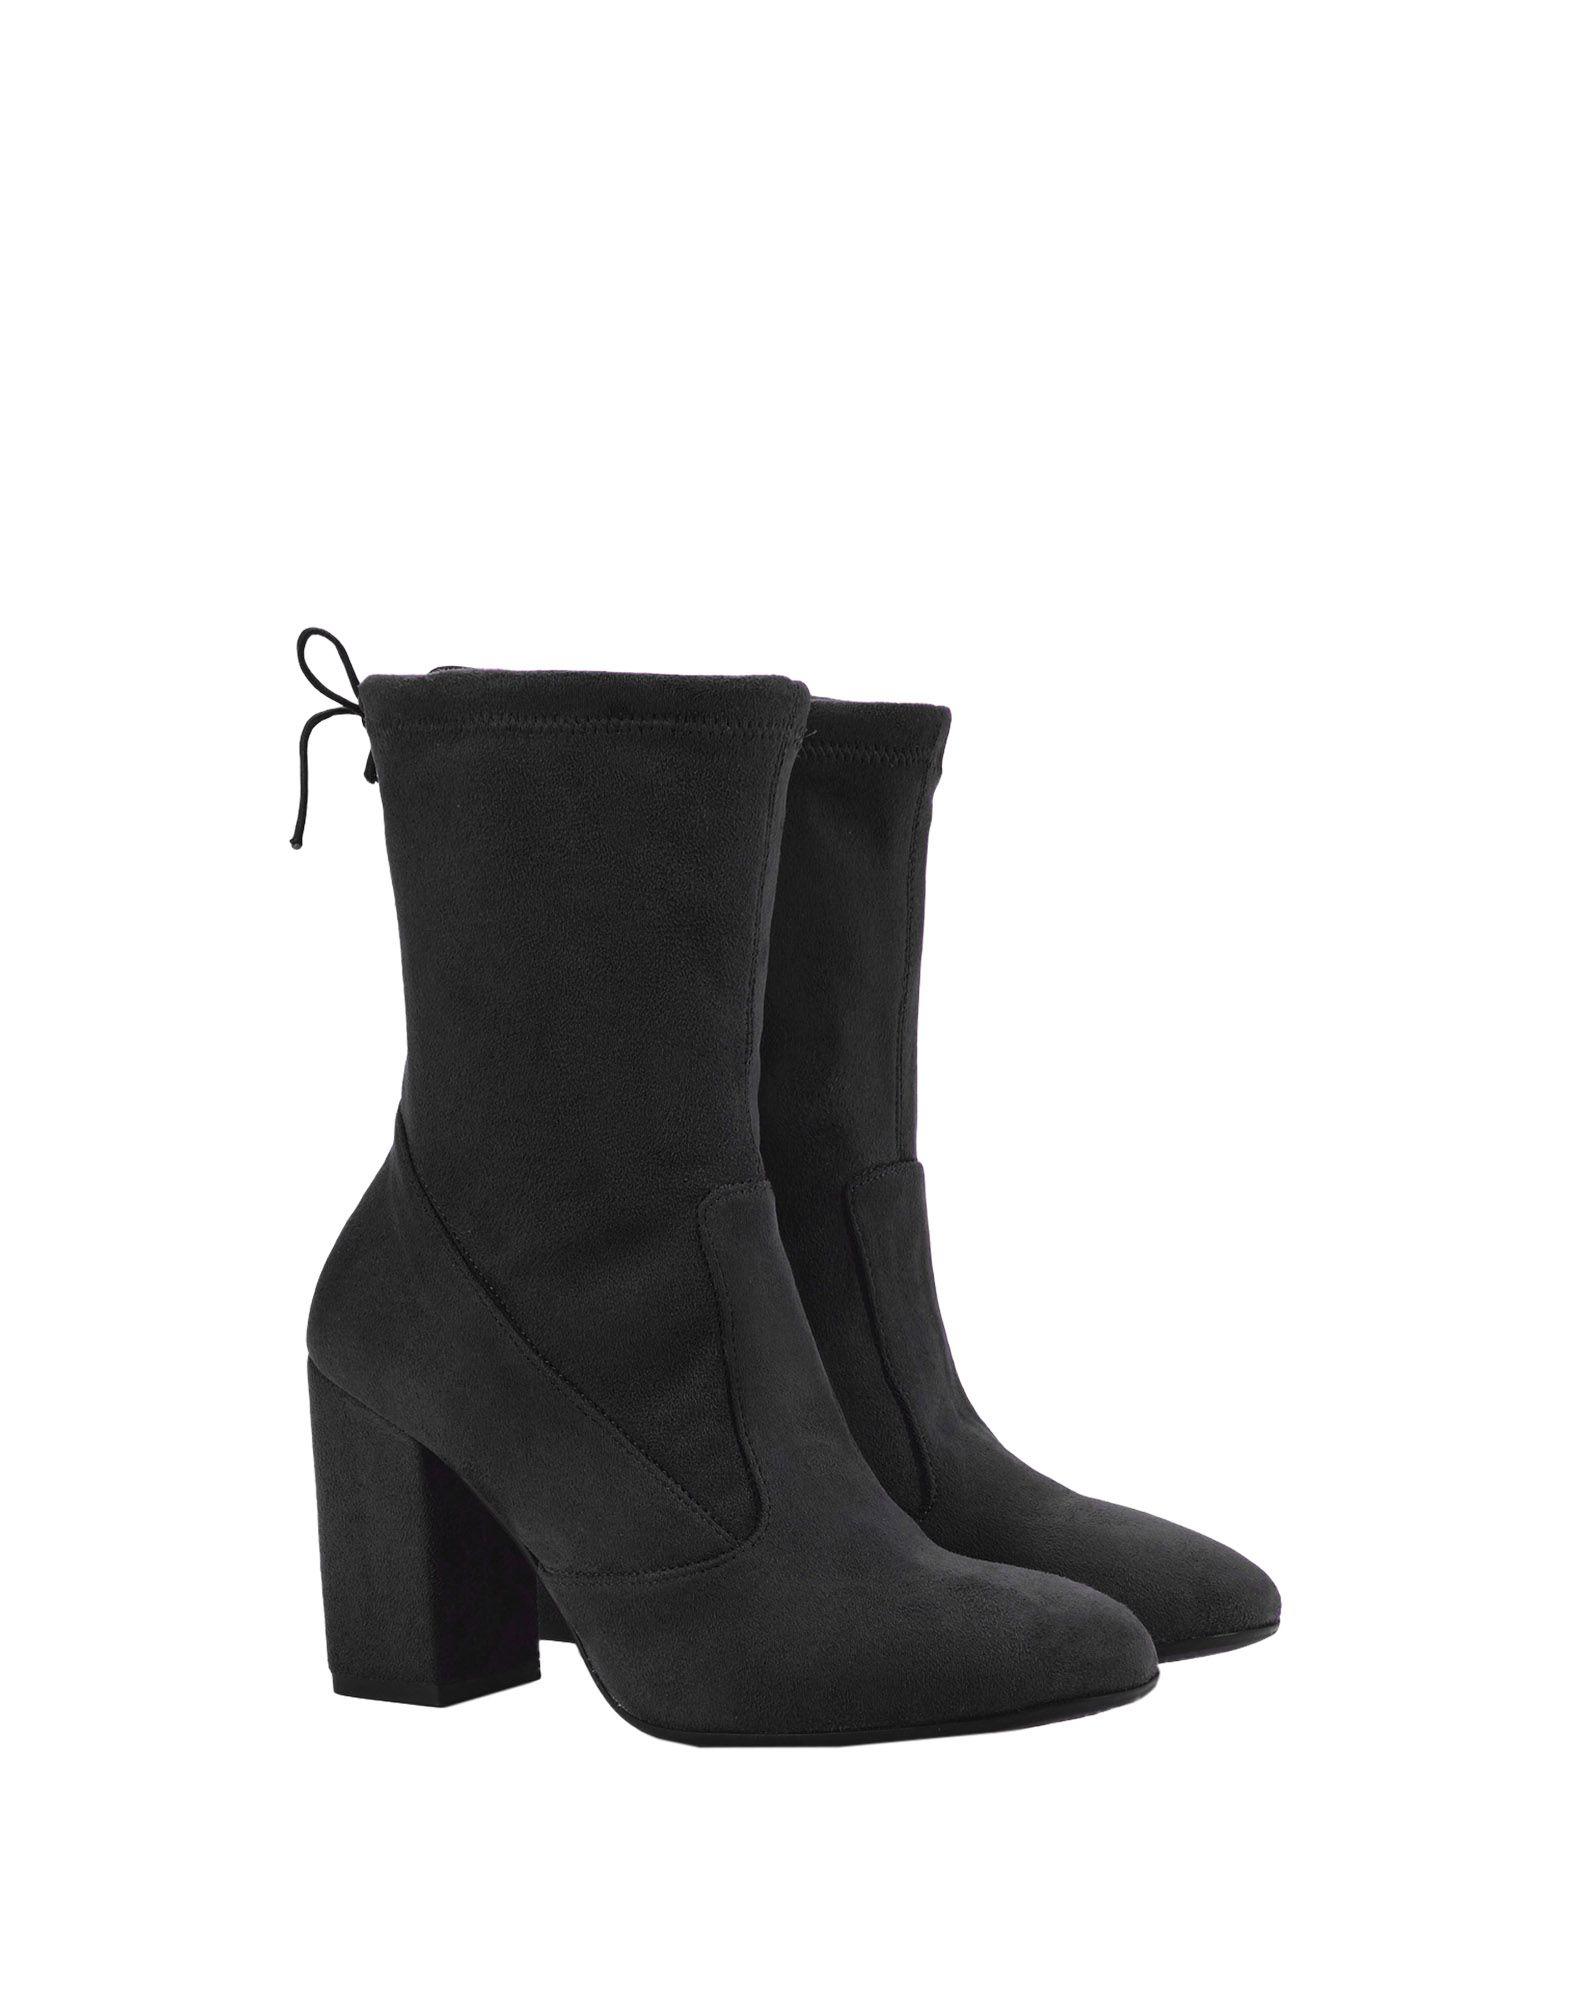 George J. 11403643TV Love Stiefelette Damen  11403643TV J. Gute Qualität beliebte Schuhe c0adec